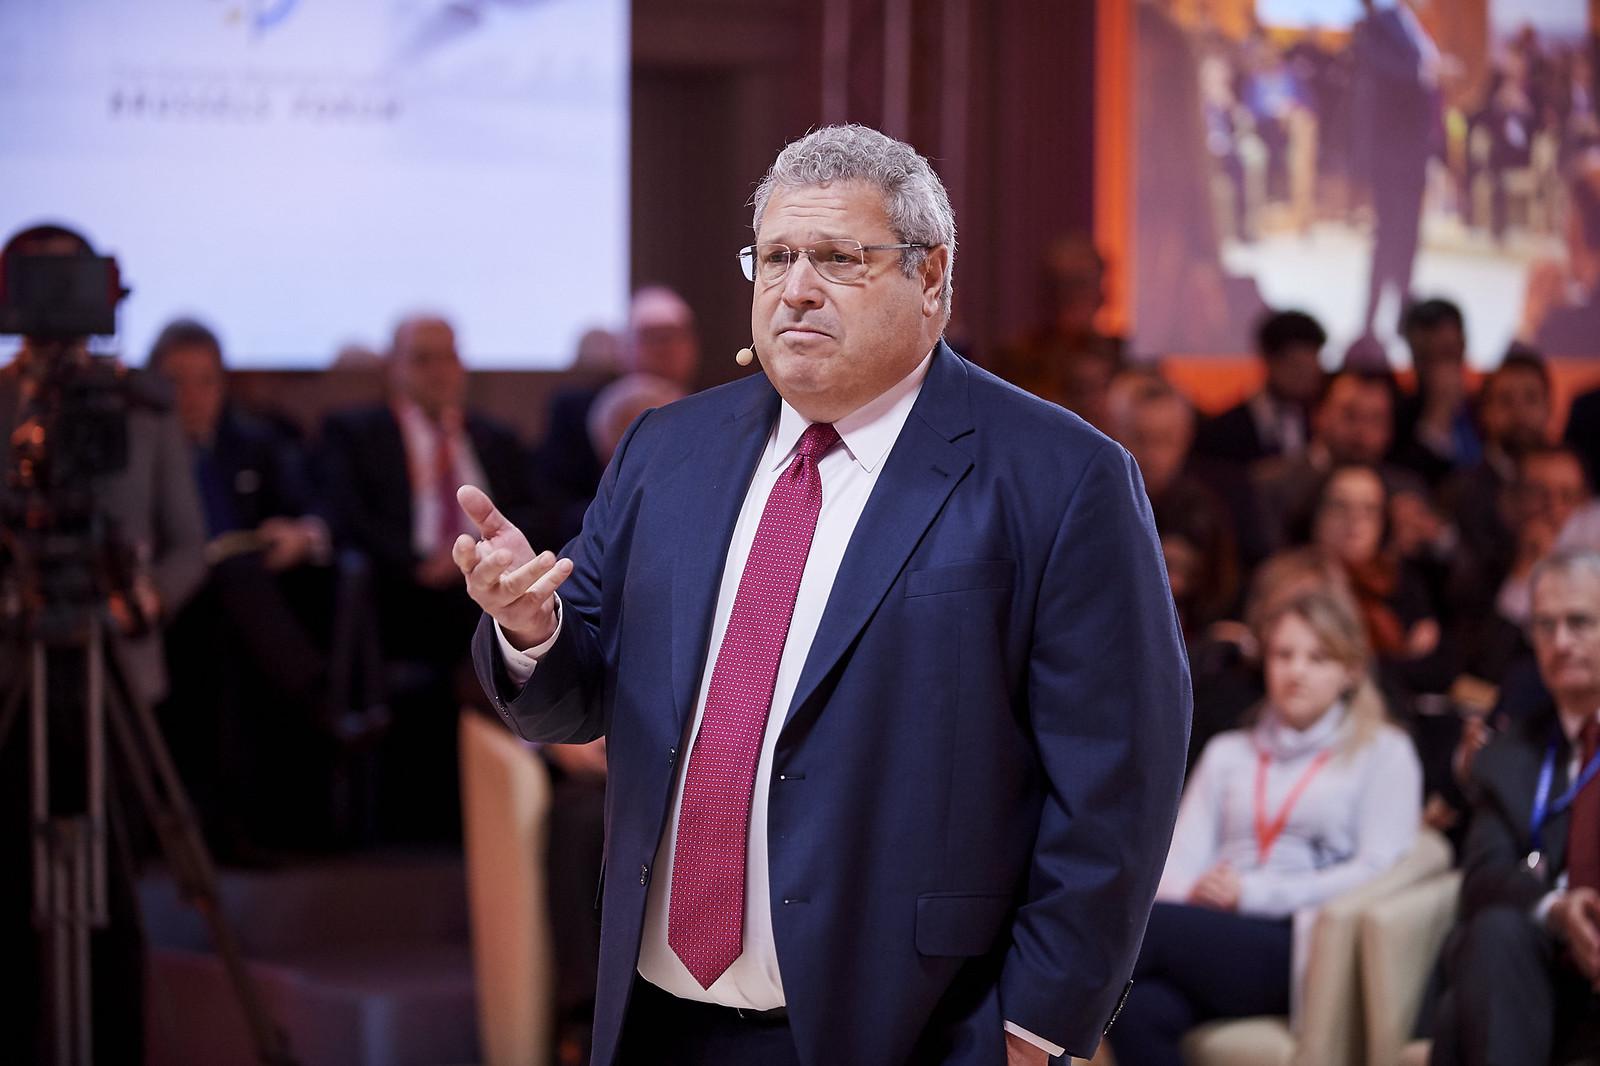 Brussels Forum 2018: Opening